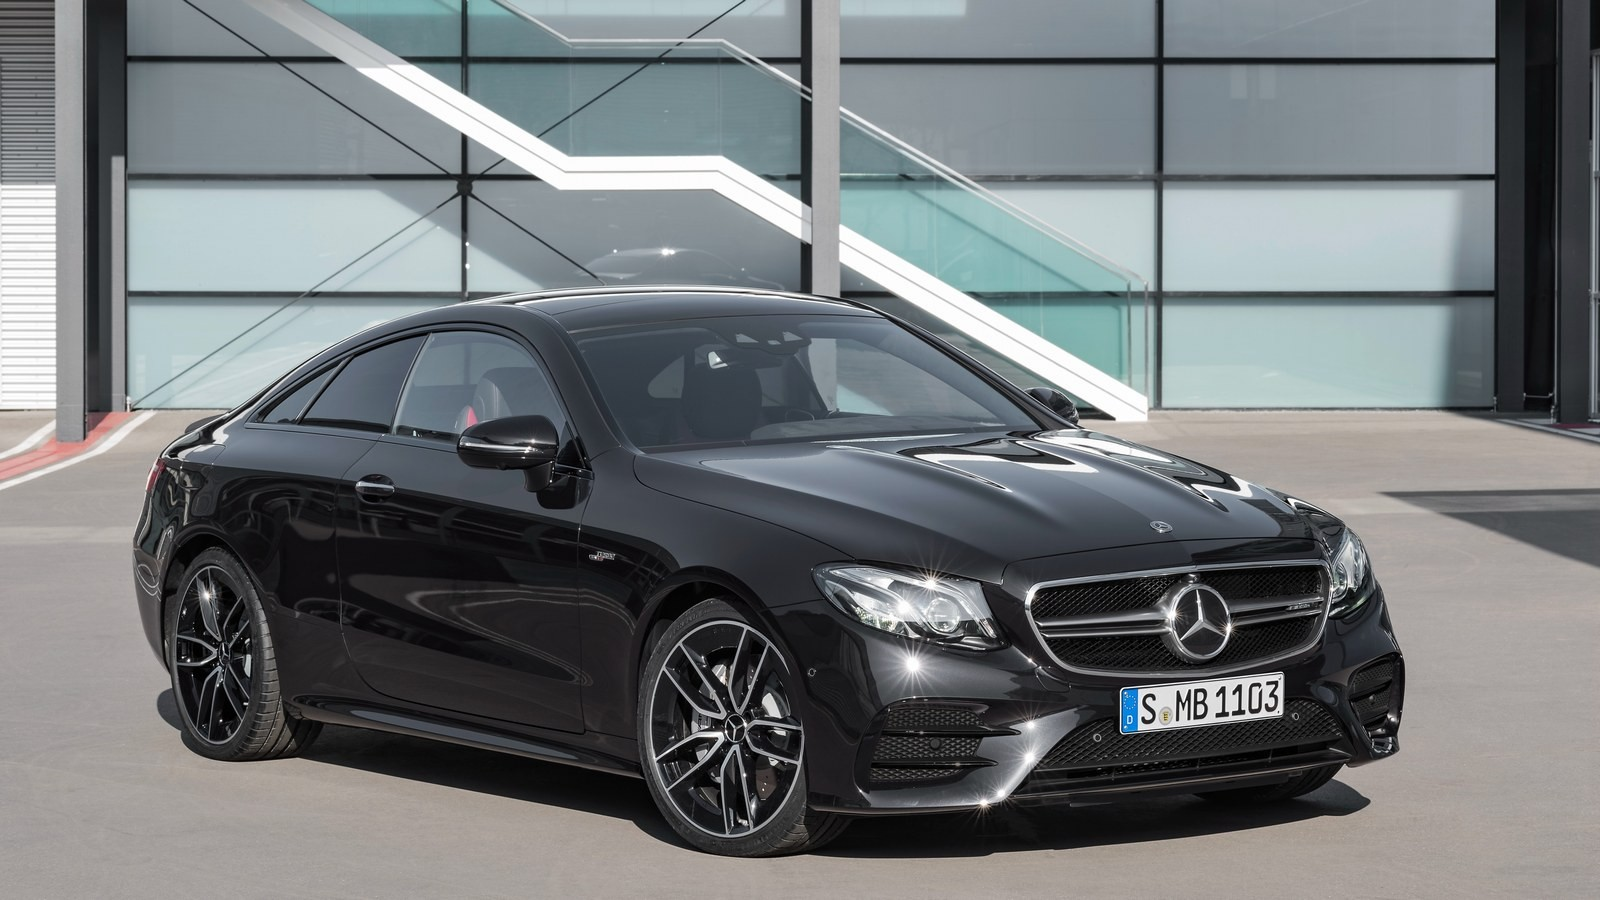 Mercedes-AMG E 53 Coupe 4MATIC+